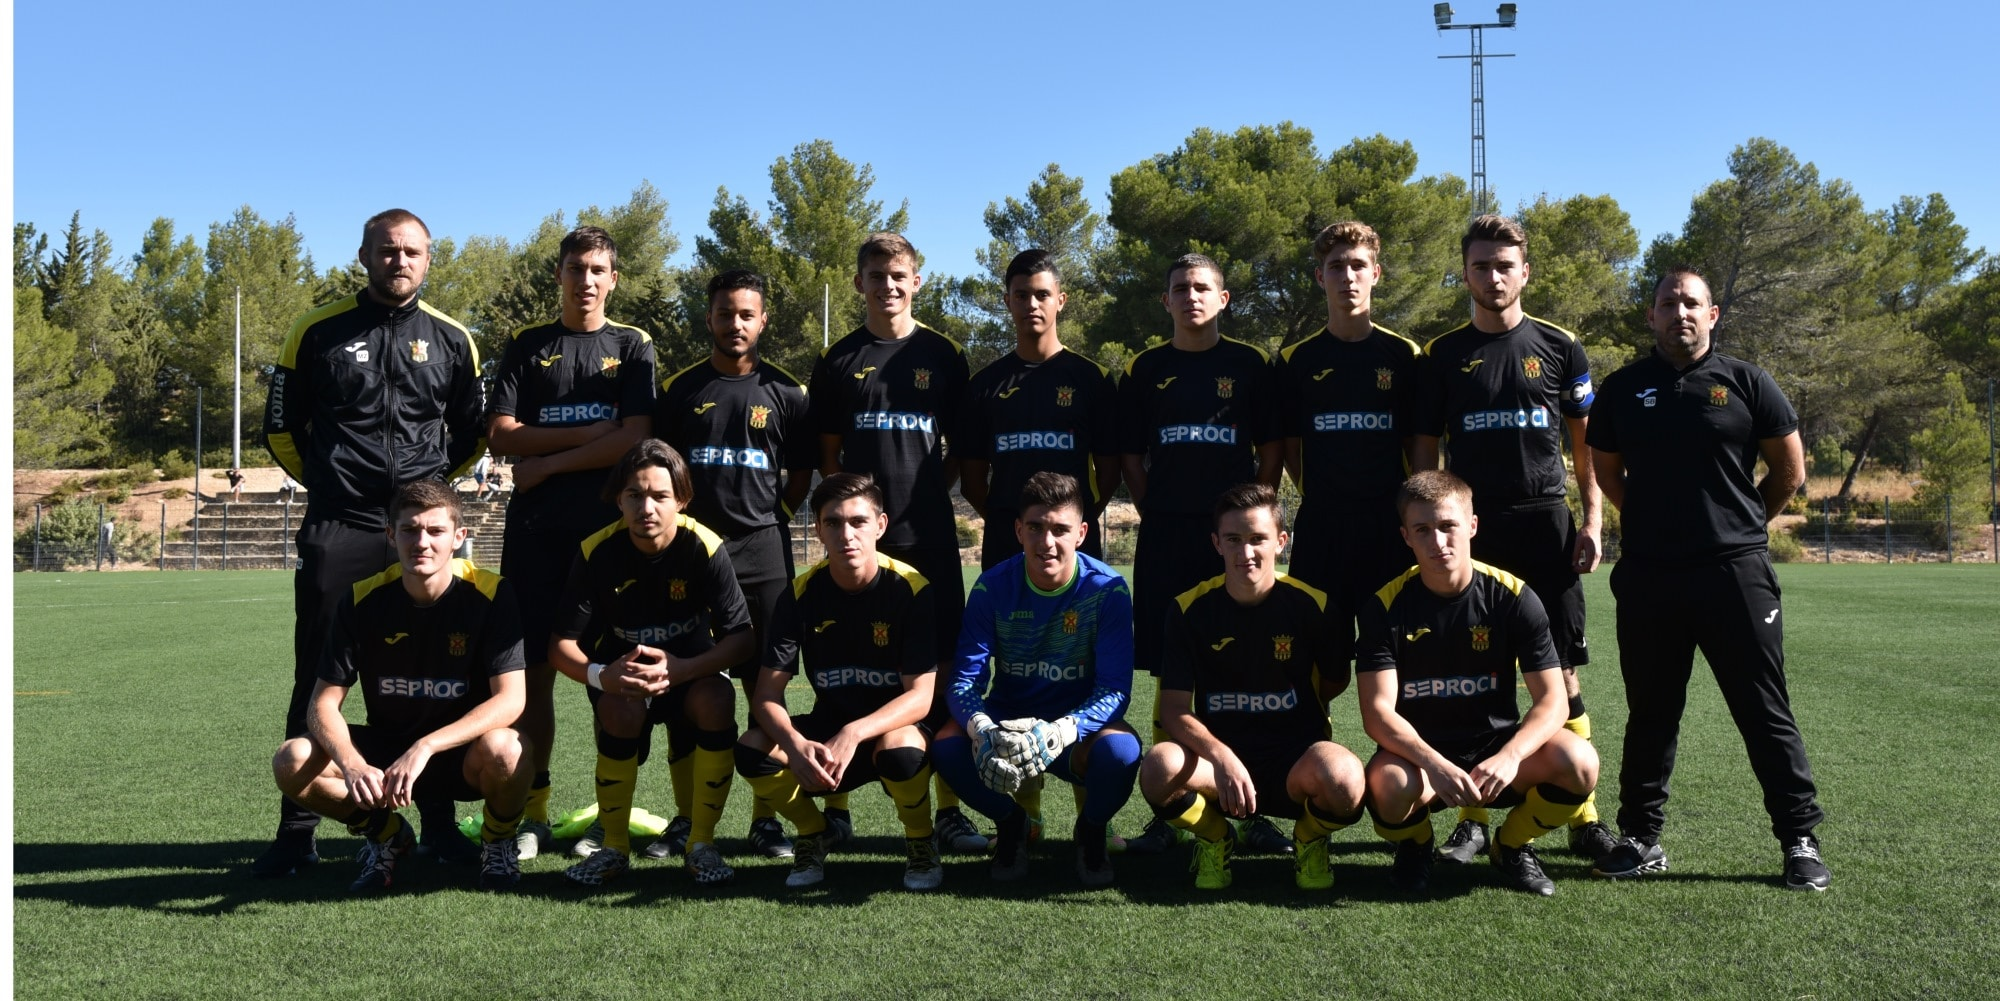 U19 - DHR (USV)